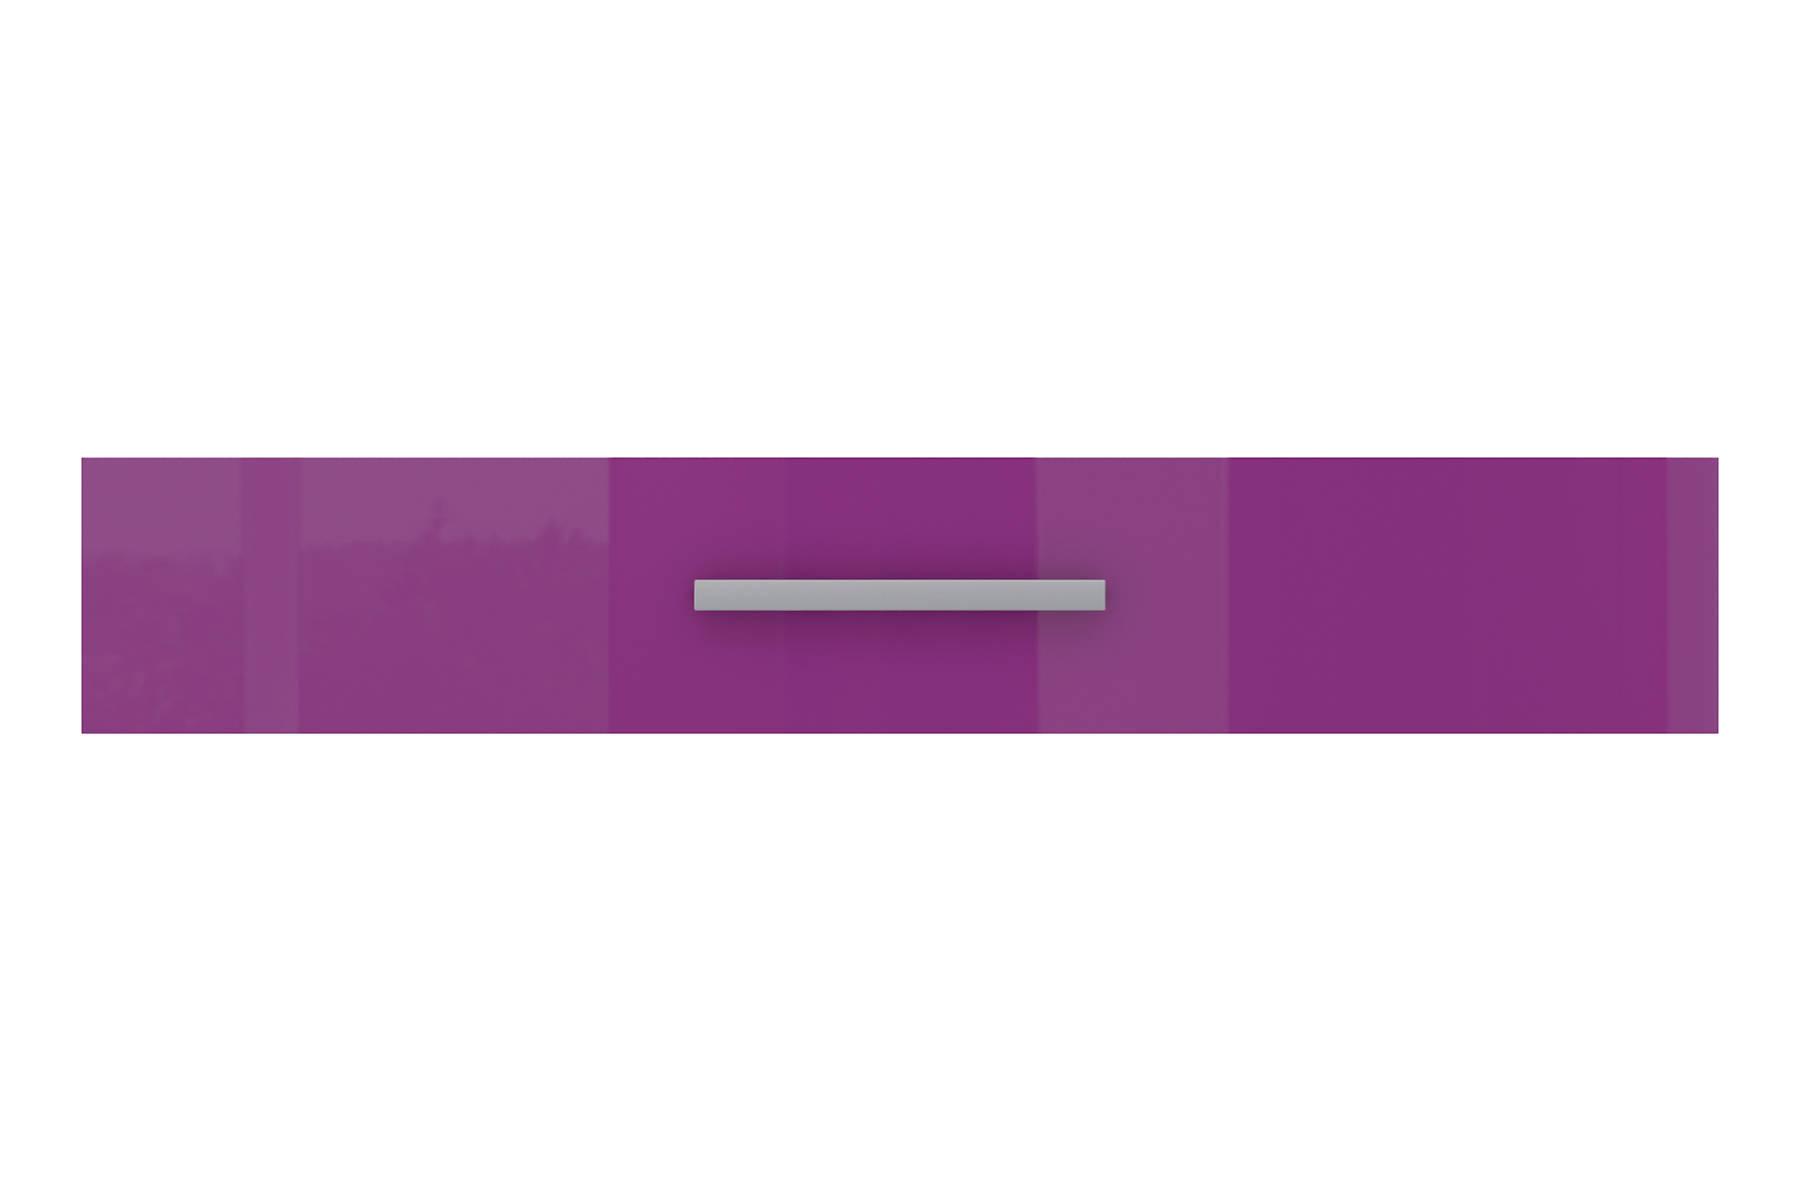 Фасад под духовку Хелена СТЛ.276.11 Фиолетовый глянец хелена роз свои правила